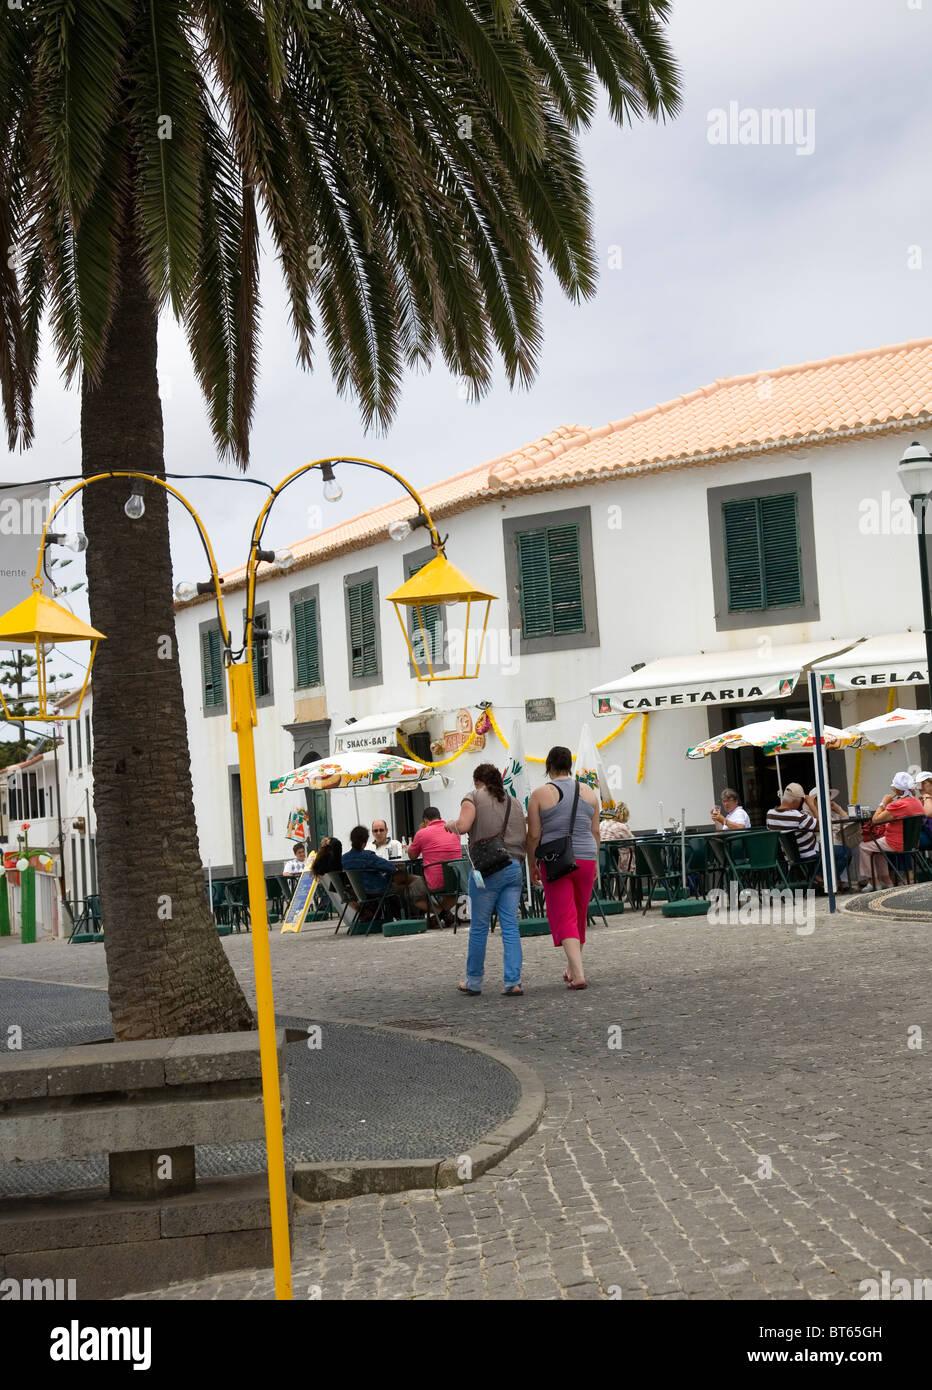 Porto Santo Town Square - Stock Image